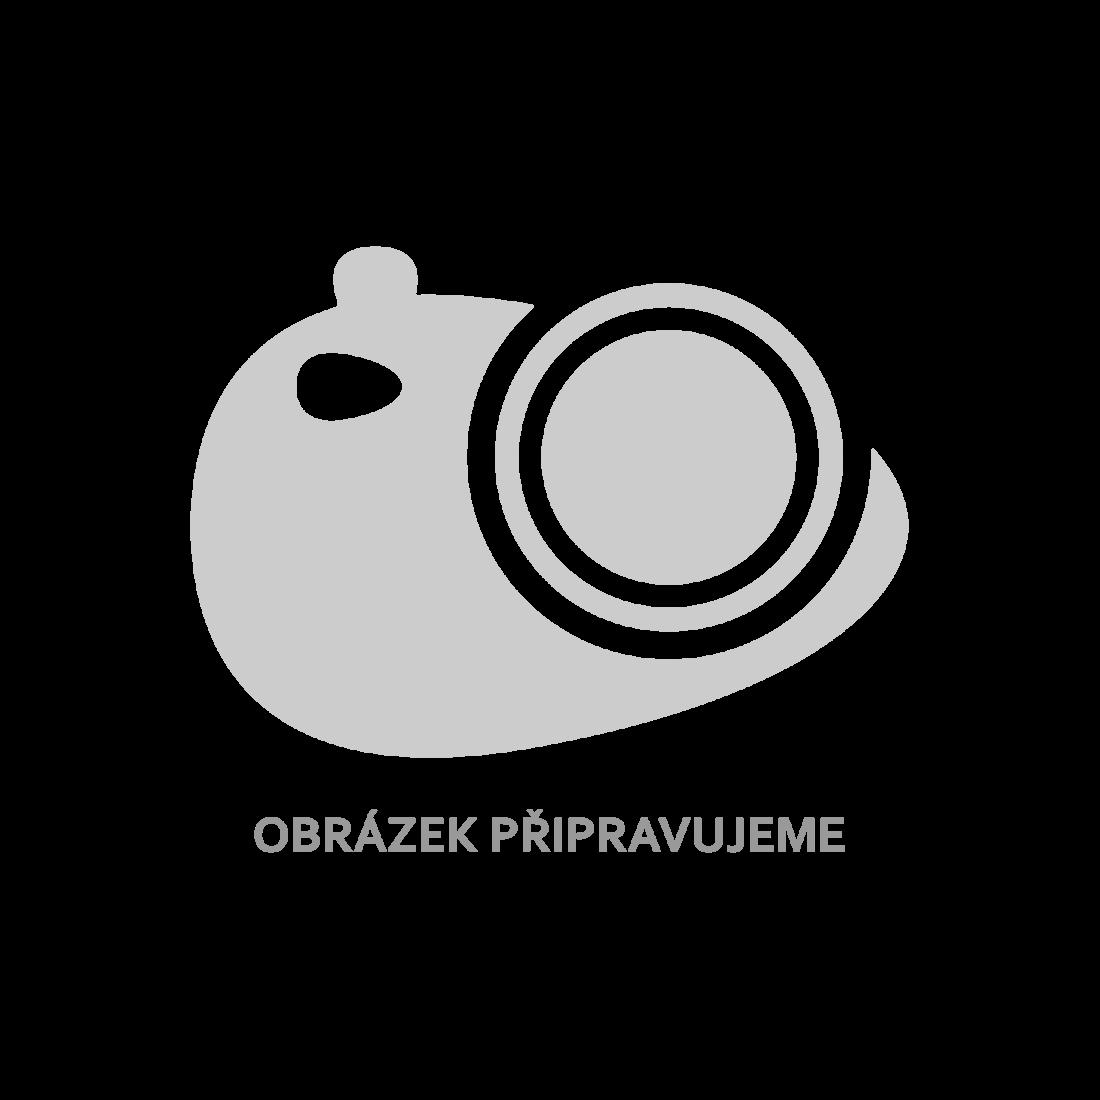 Plachta proti slunci oxford, trojúhelník 3,6x3,6x3,6m béžová